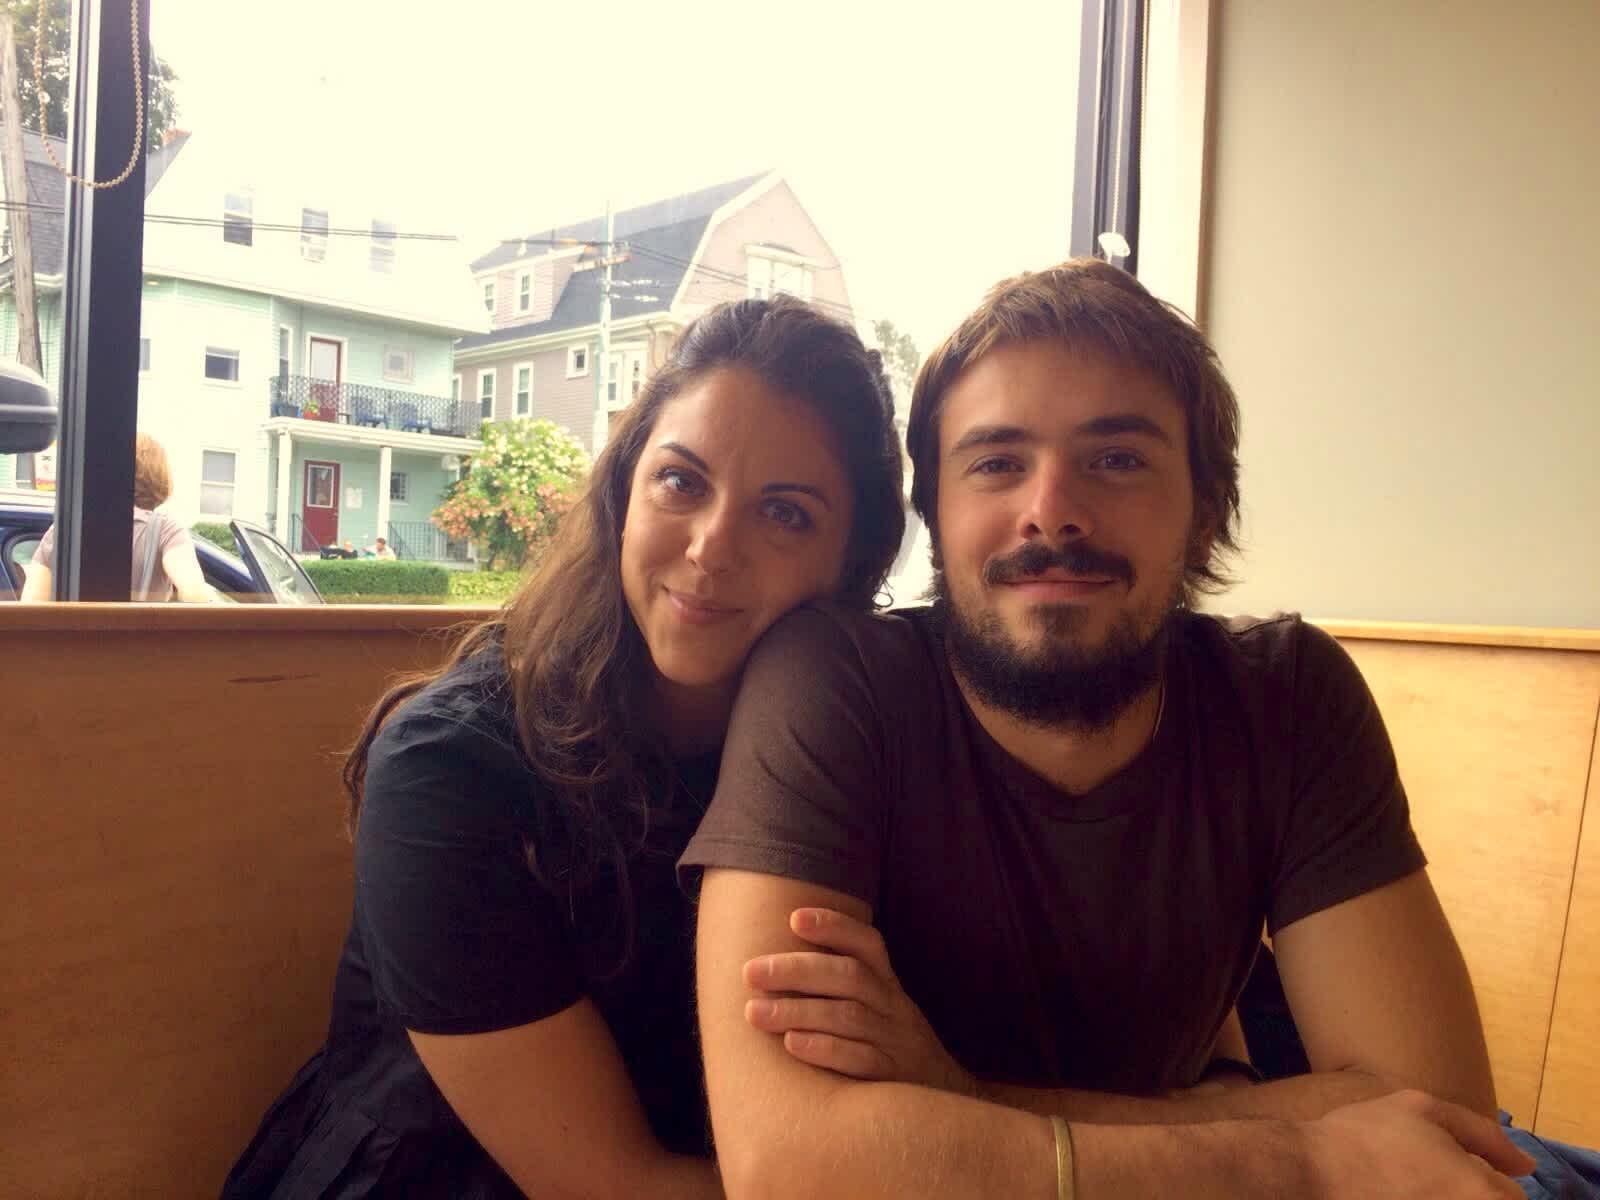 Irene & Matteo from Rome, Italy